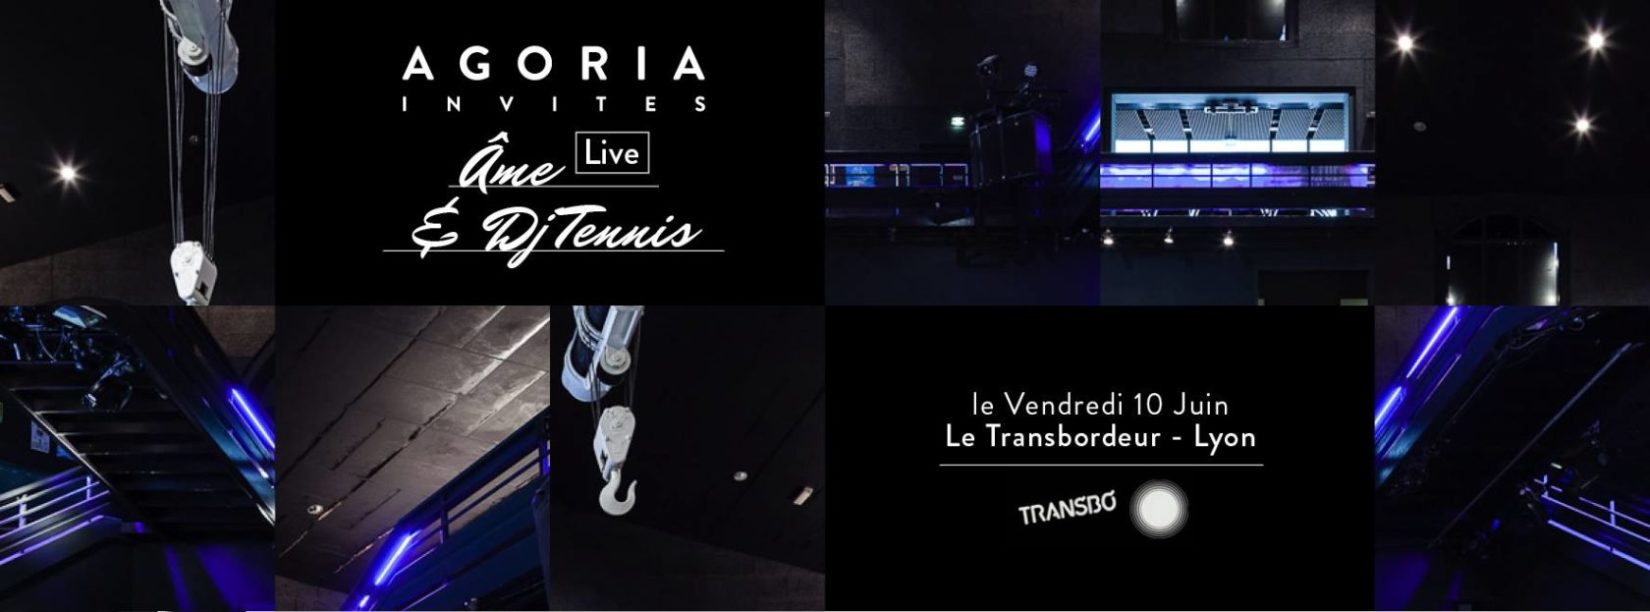 We Are Reality - Agoria Invite Ame Live & Dj Tennis